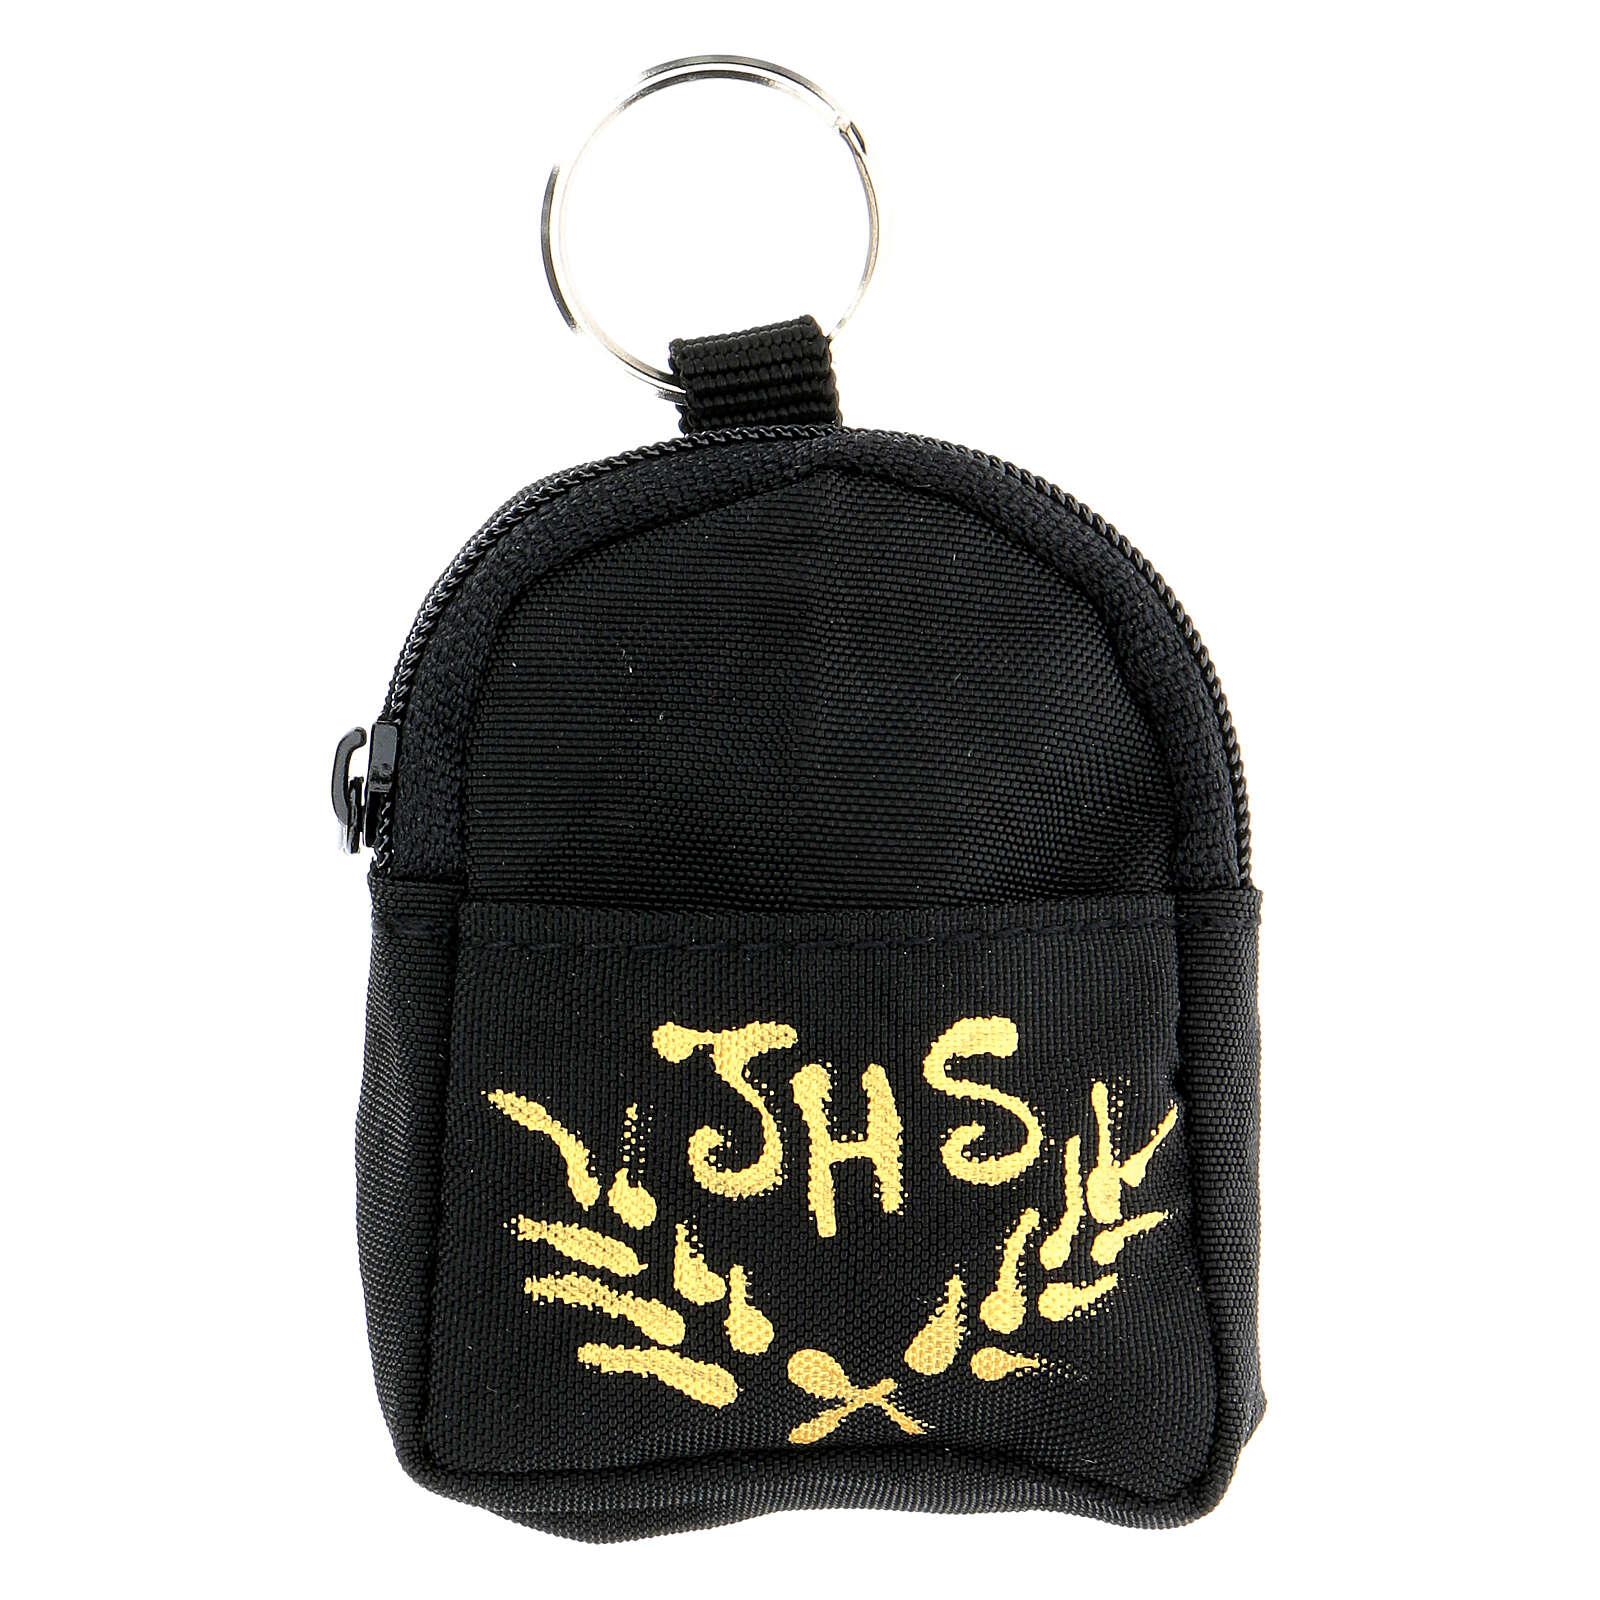 Zainetto portachiavi nero IHS dipinto a mano 3